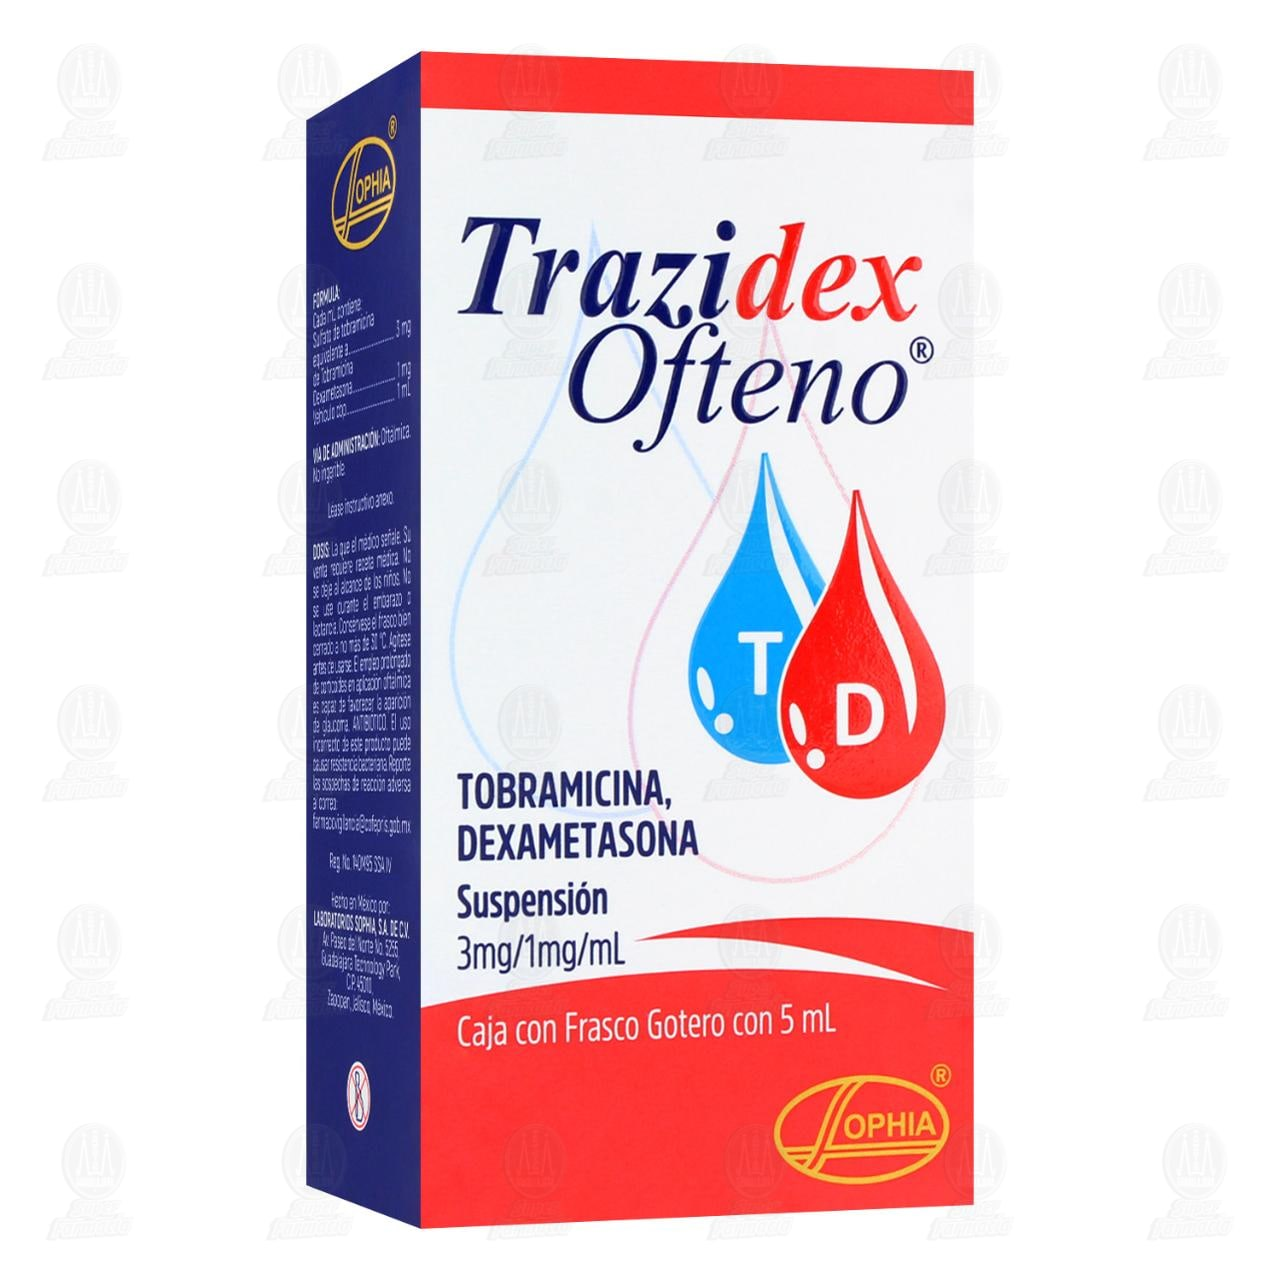 Trazidex Ofteno 5ml Suspensión Gotas